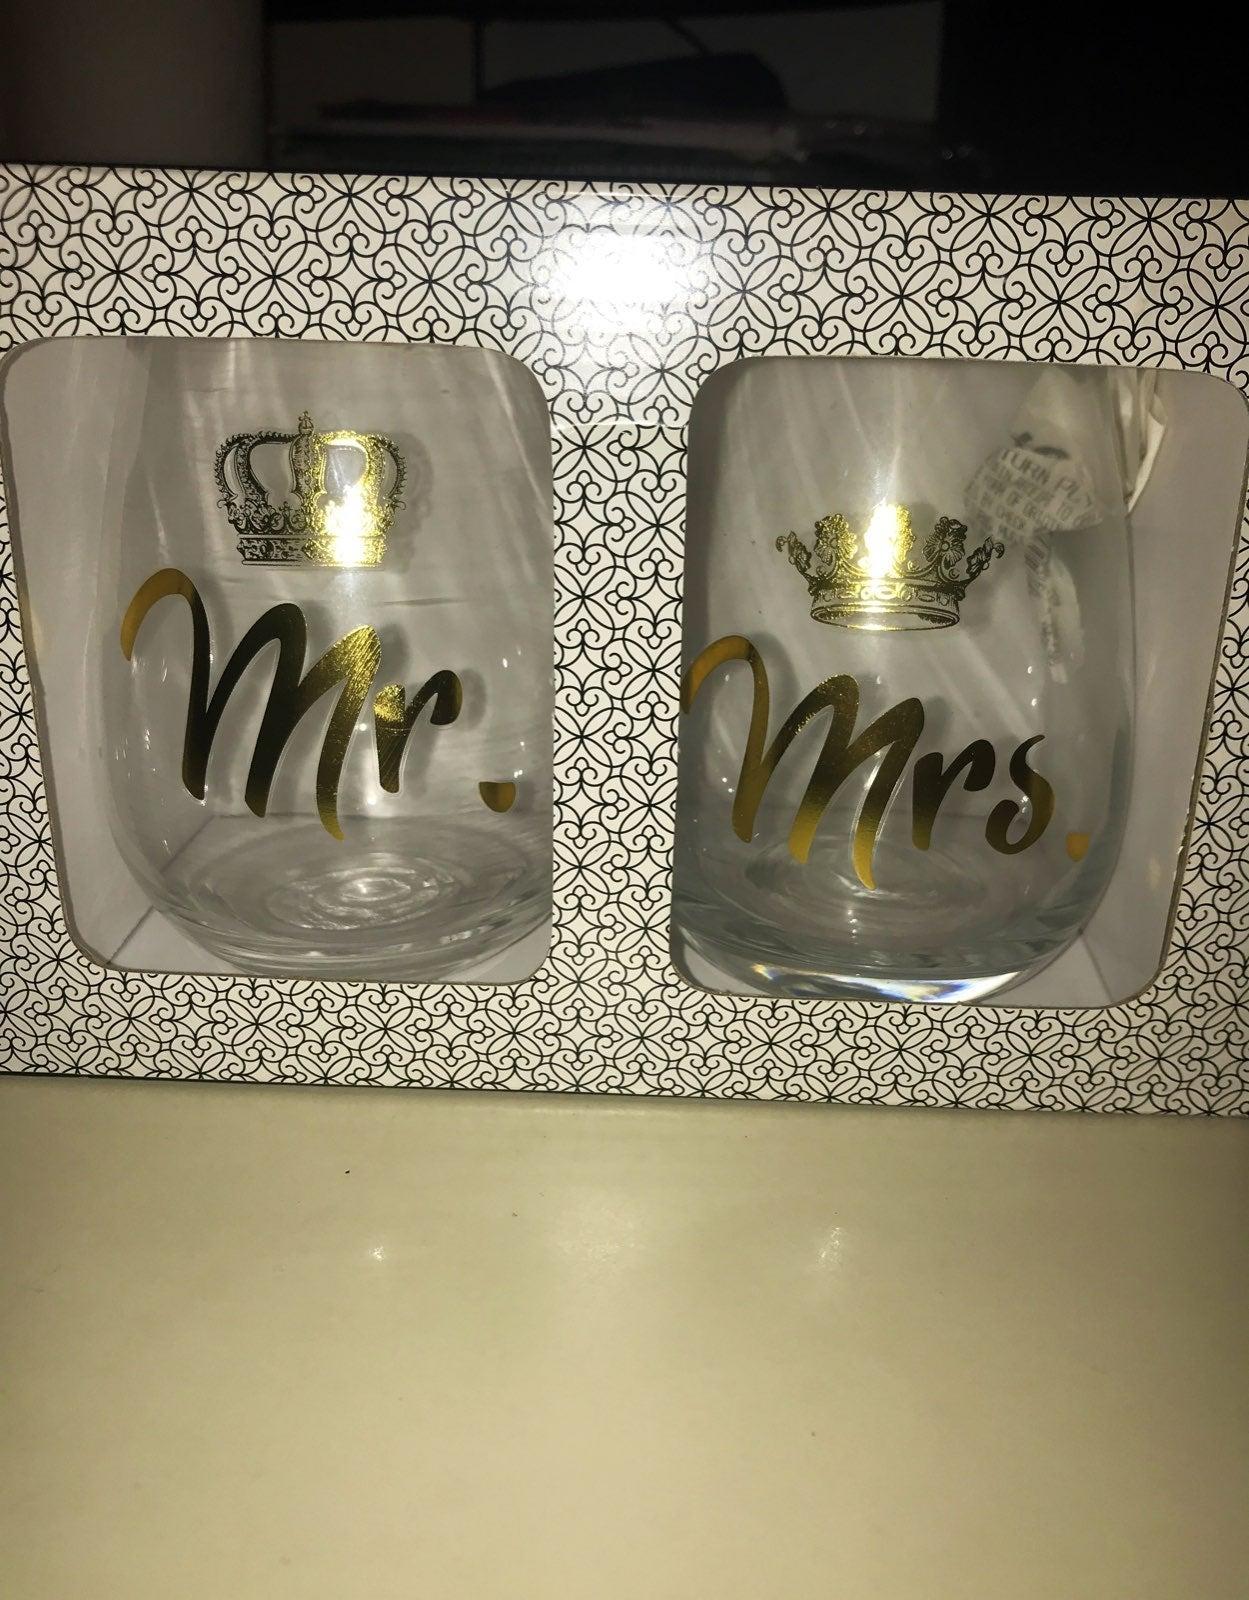 Better Together: 2 Stemless Wine Glasses